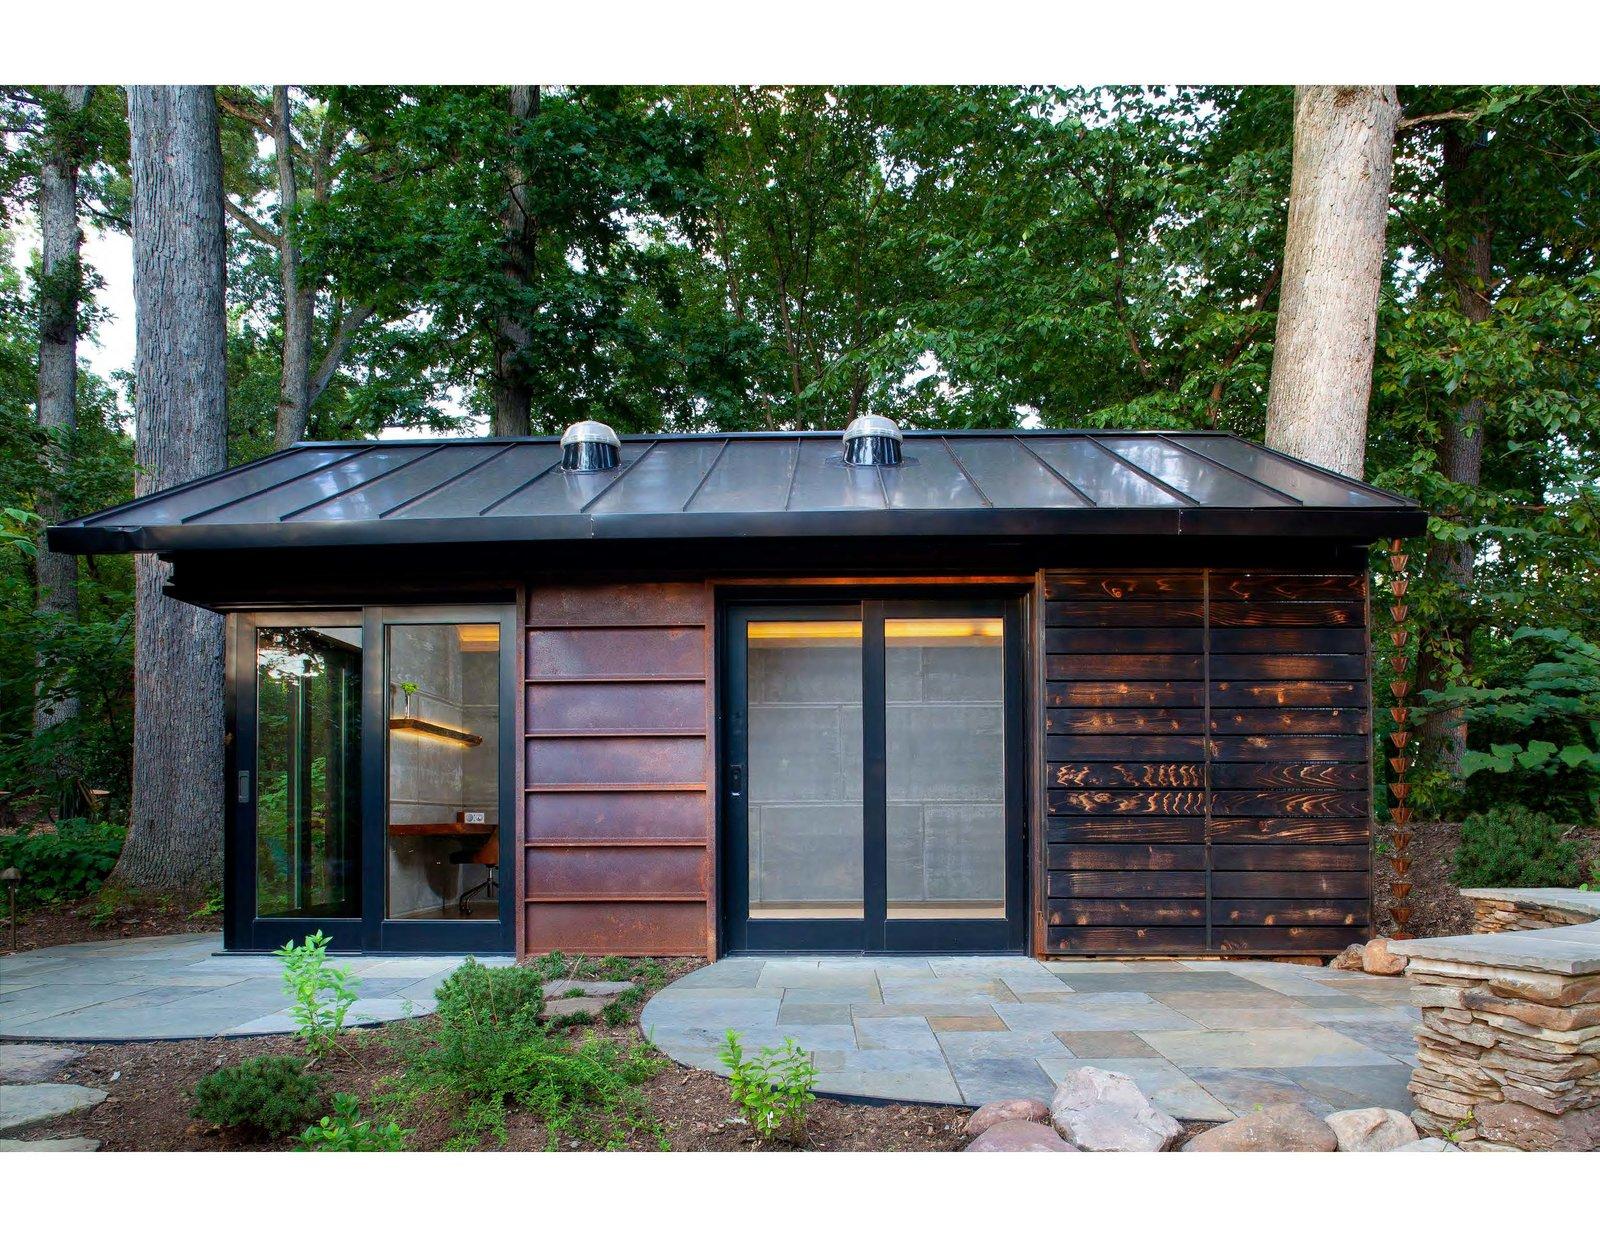 Creative Cabin GreenSpur McAllister Architects exterior